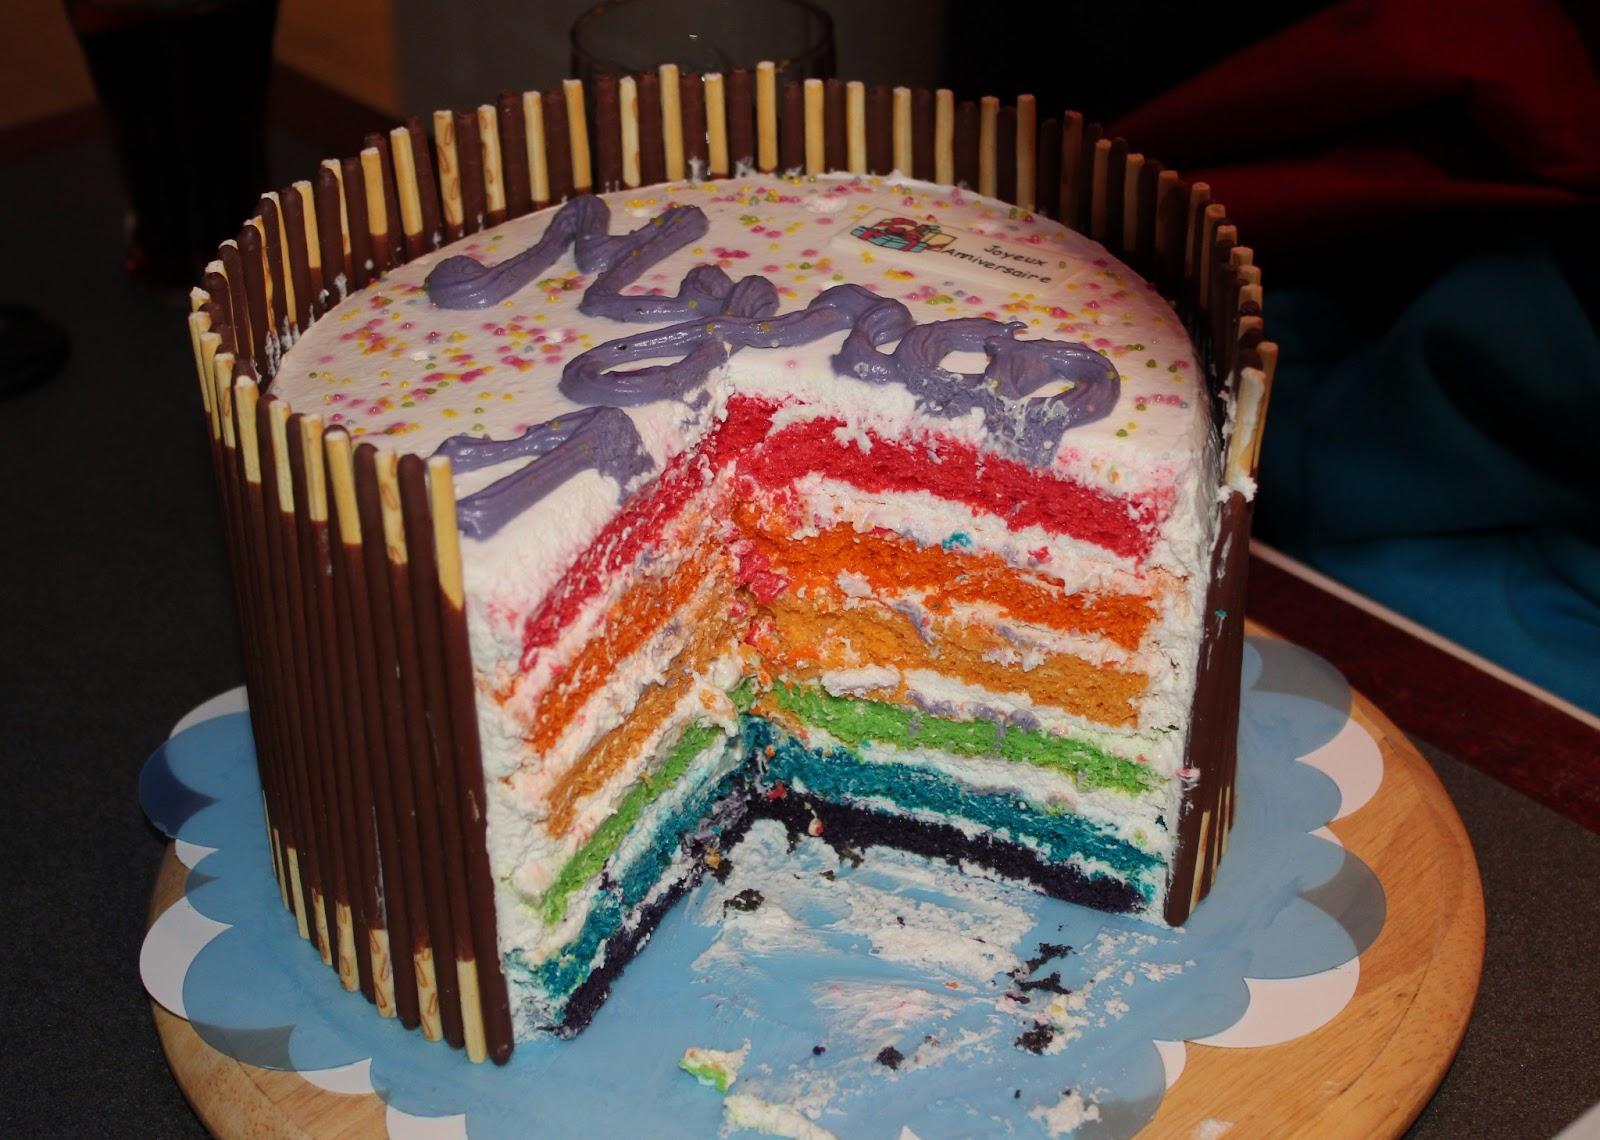 jessy 39 s kitchen g teau arc en ciel rainbow cake. Black Bedroom Furniture Sets. Home Design Ideas